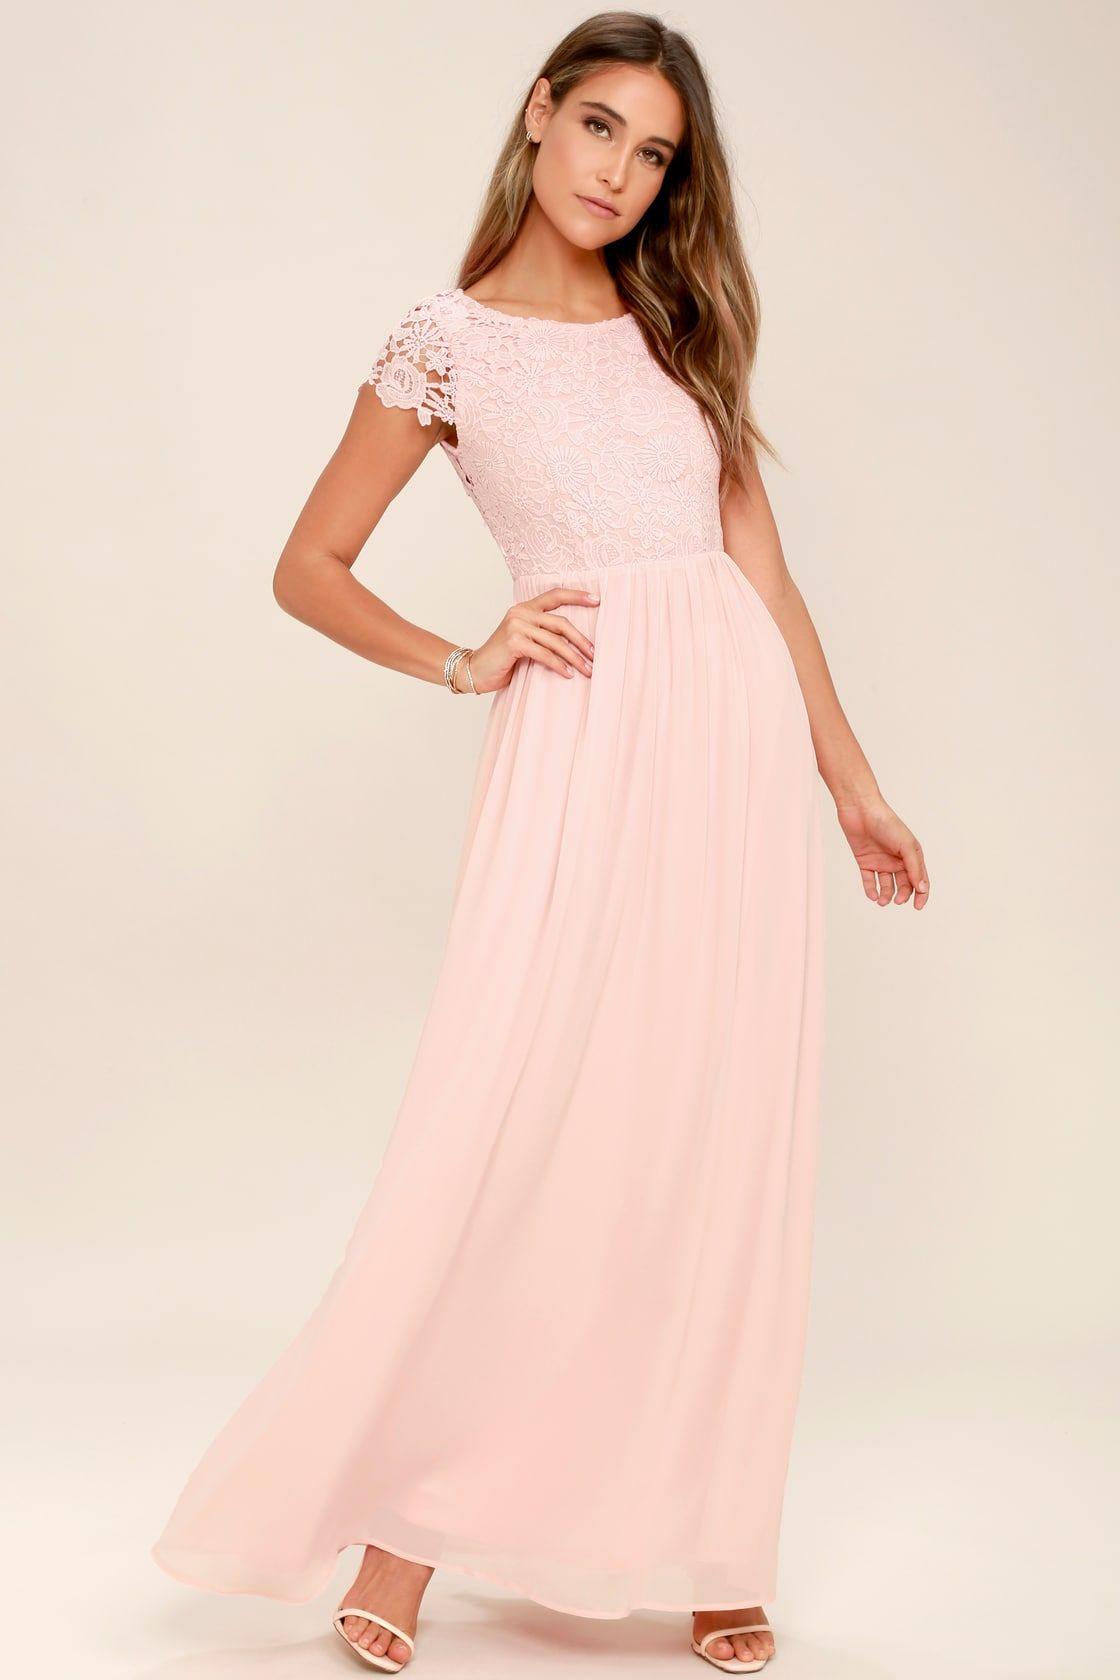 46301d5ce53b Lulus | The Greatest Blush Pink Lace Maxi Dress | Size Medium | 100 ...